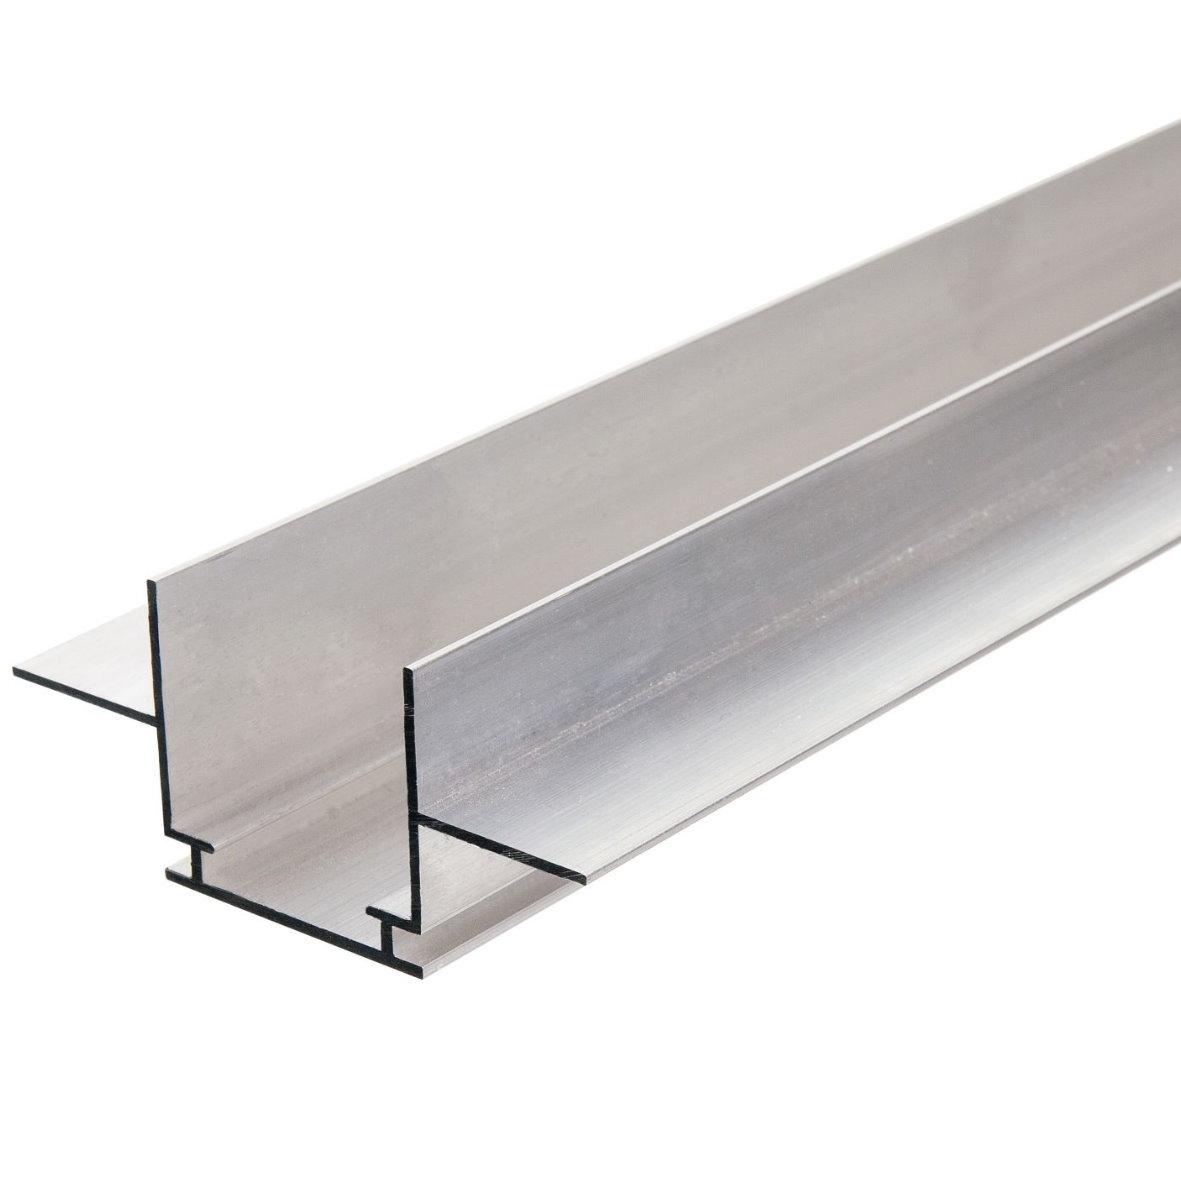 led aluminium profil aluprofil abdeckung eloxiert strip lichtband ebay. Black Bedroom Furniture Sets. Home Design Ideas